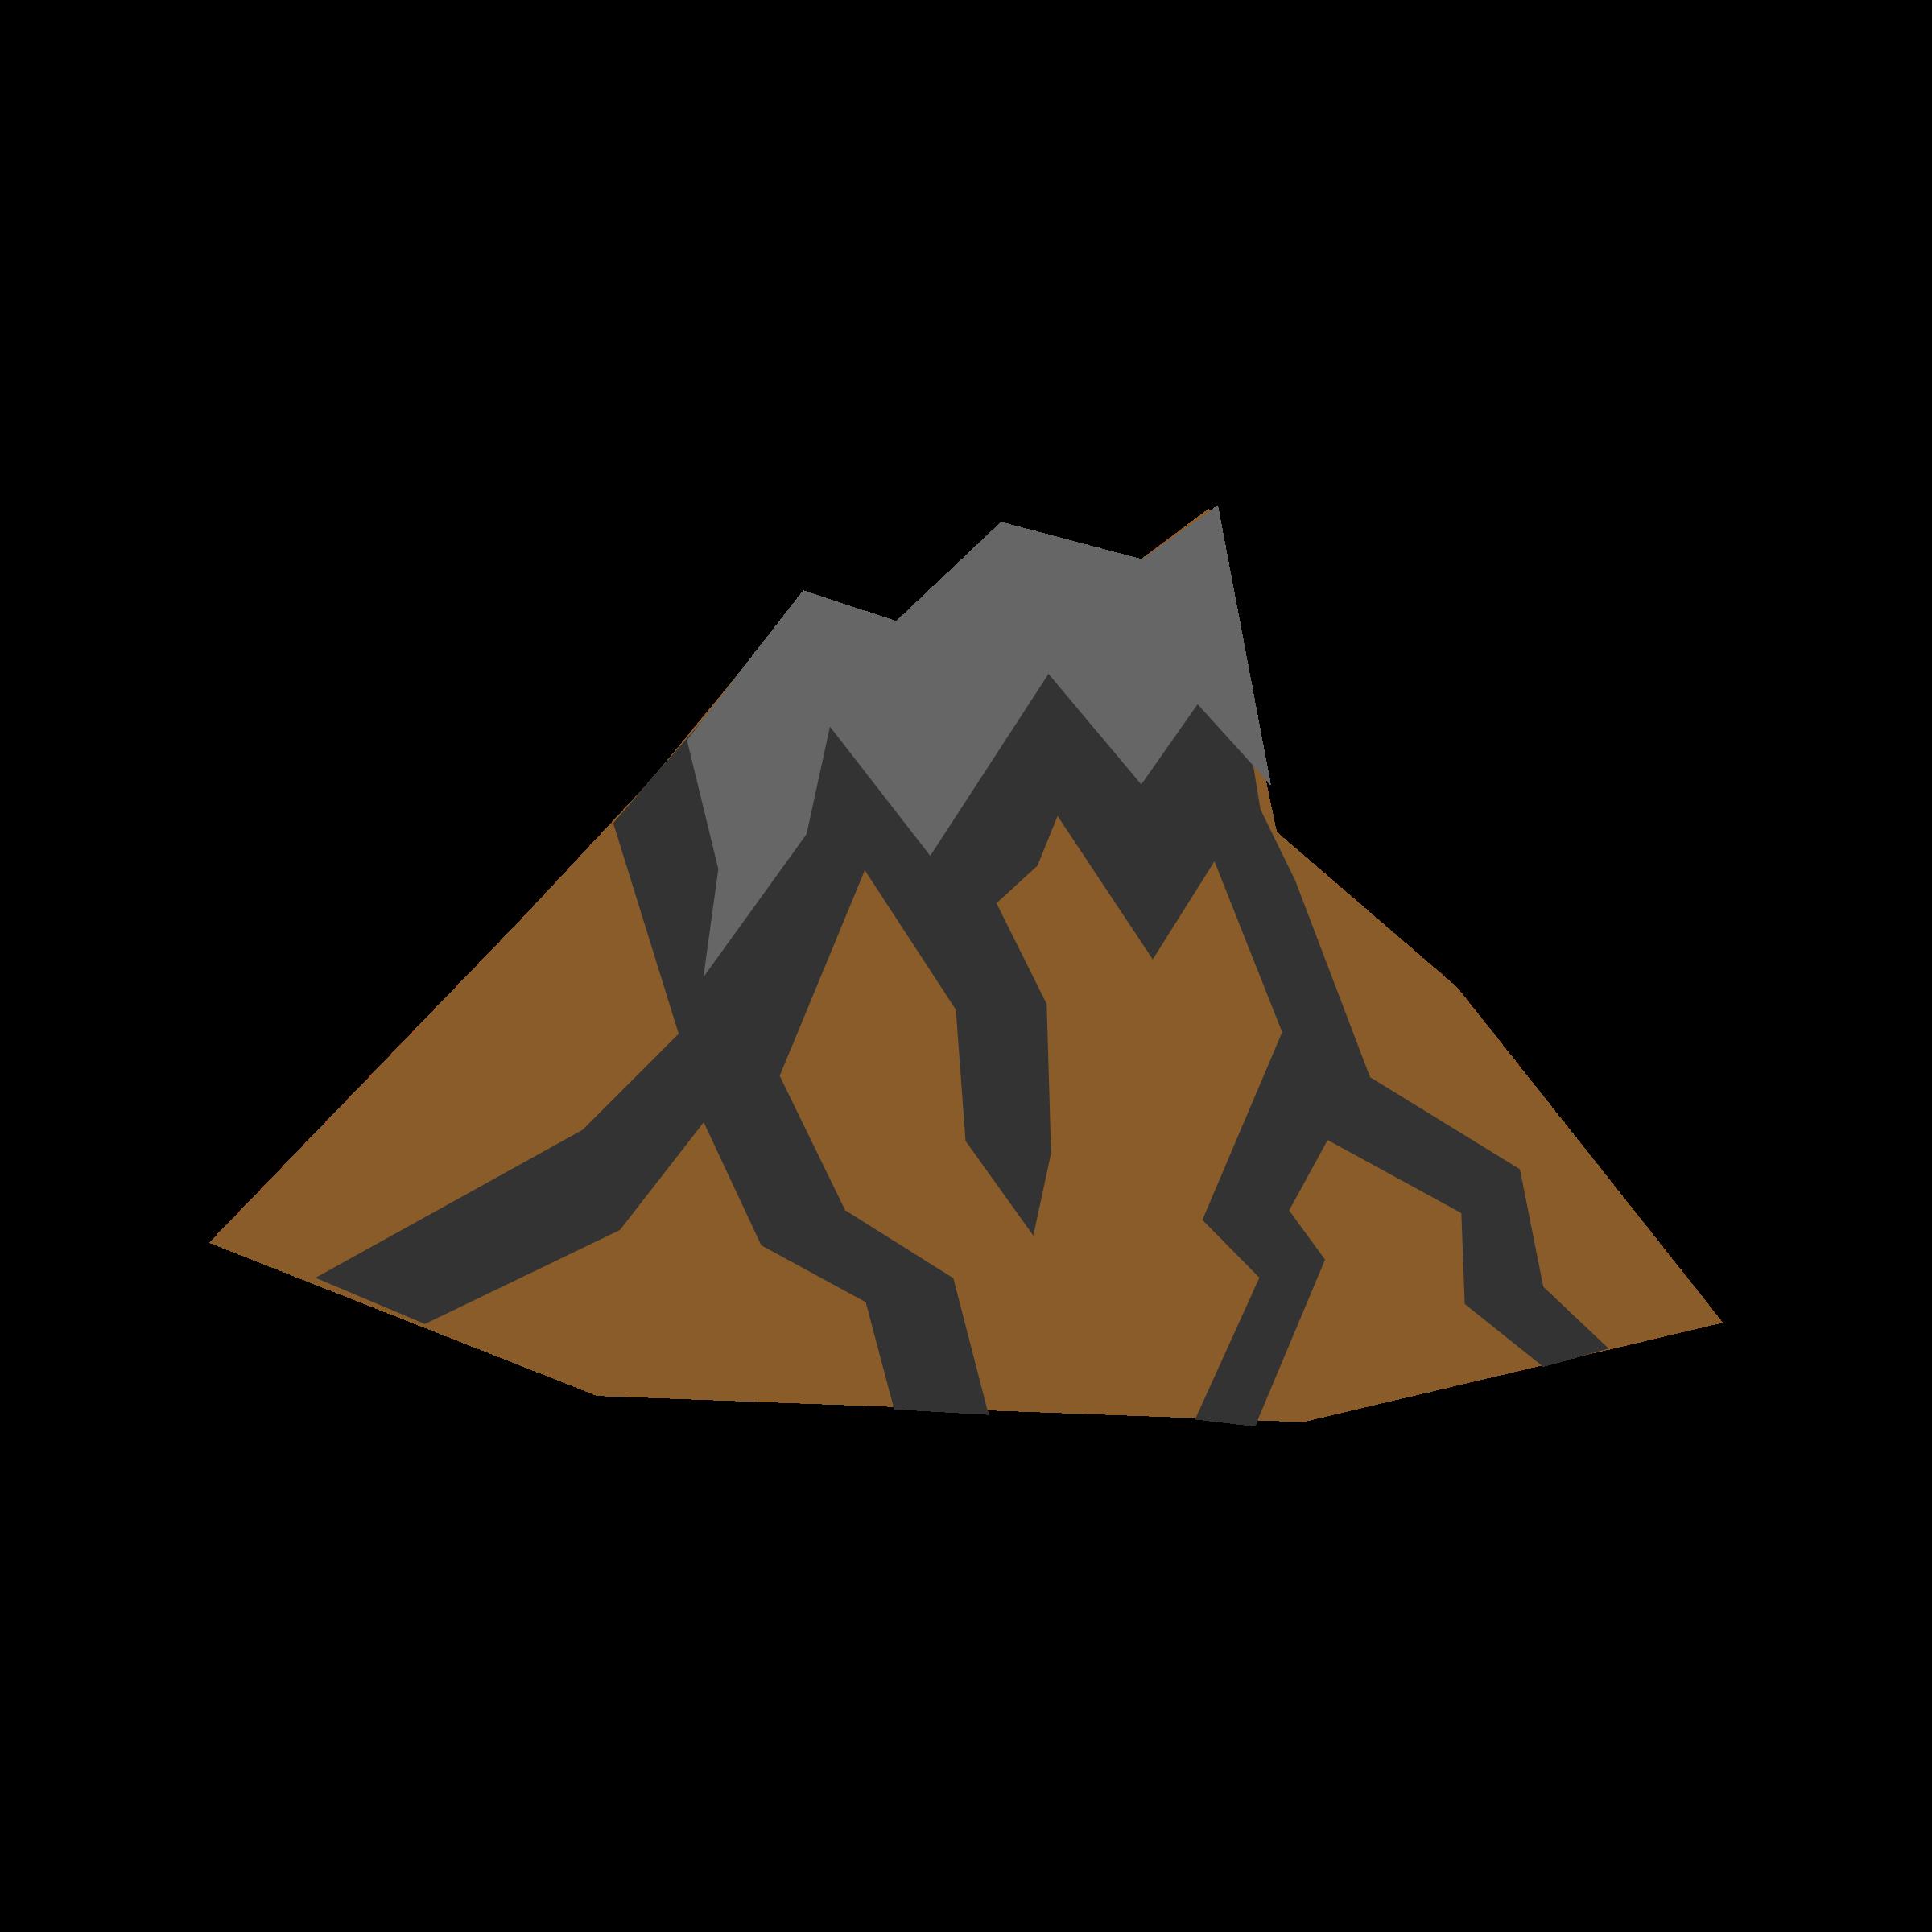 Clipart volcano dormant